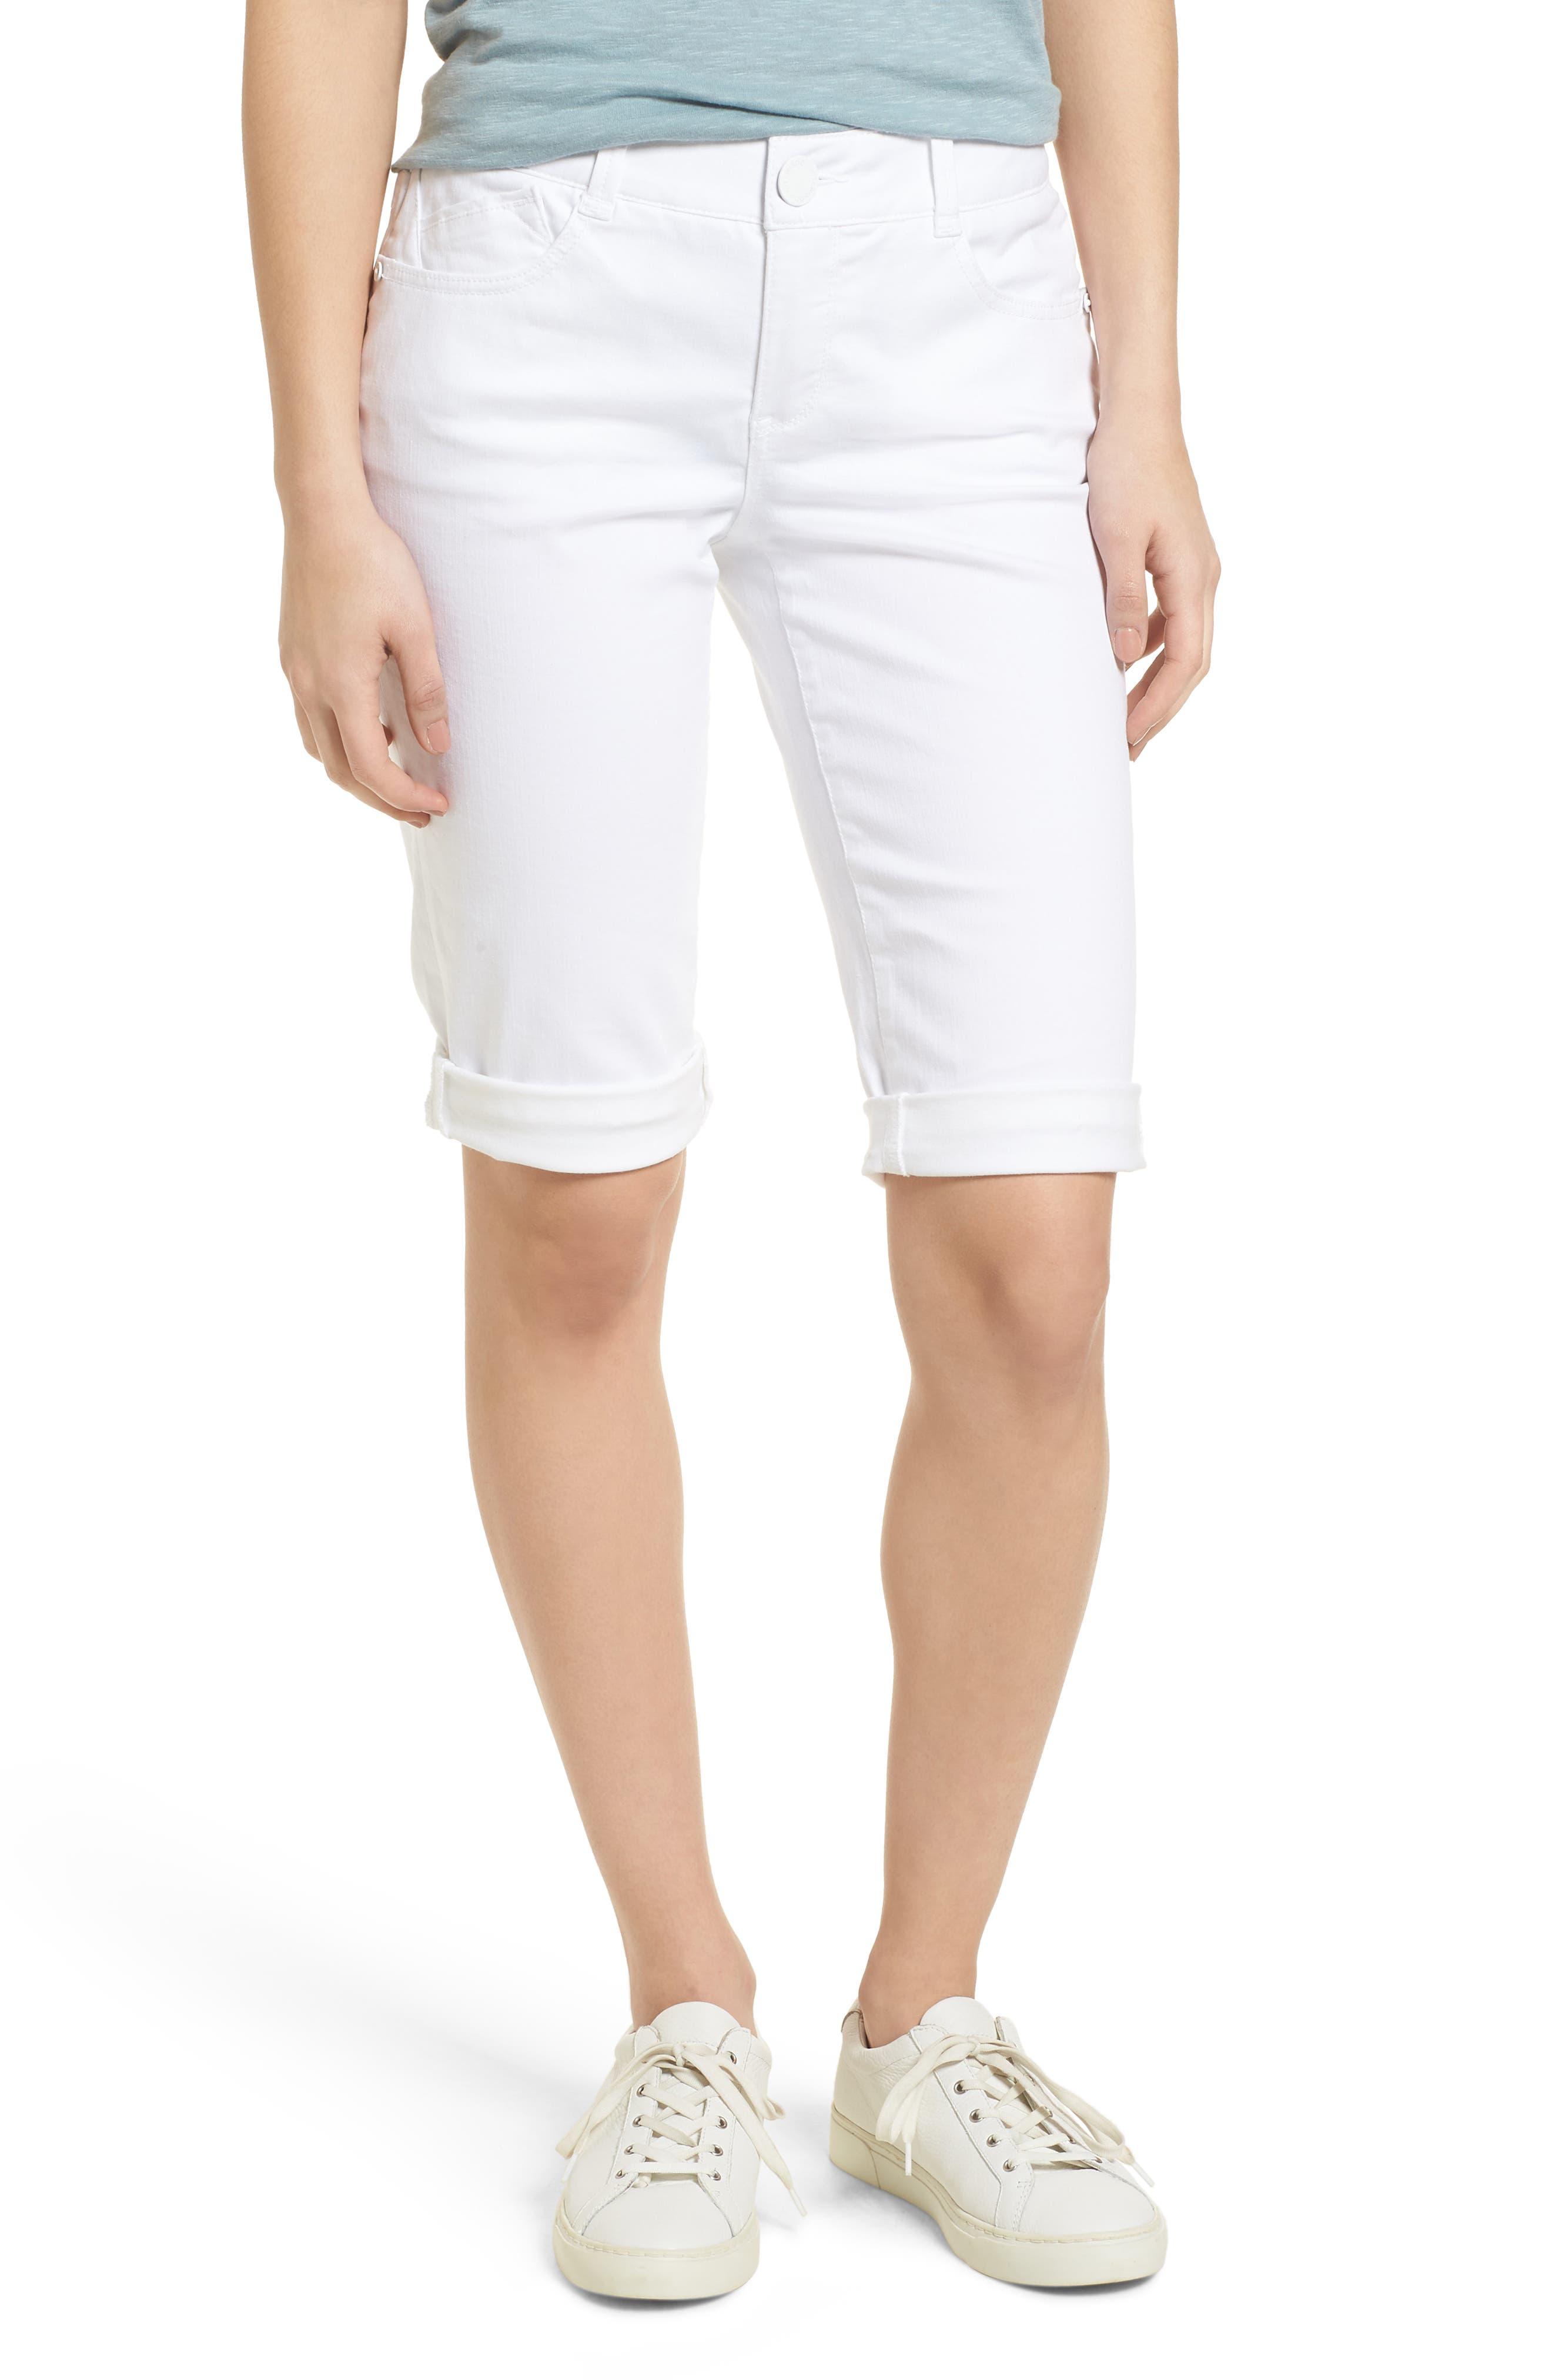 Ab-solution White Bermuda Shorts,                         Main,                         color, 106